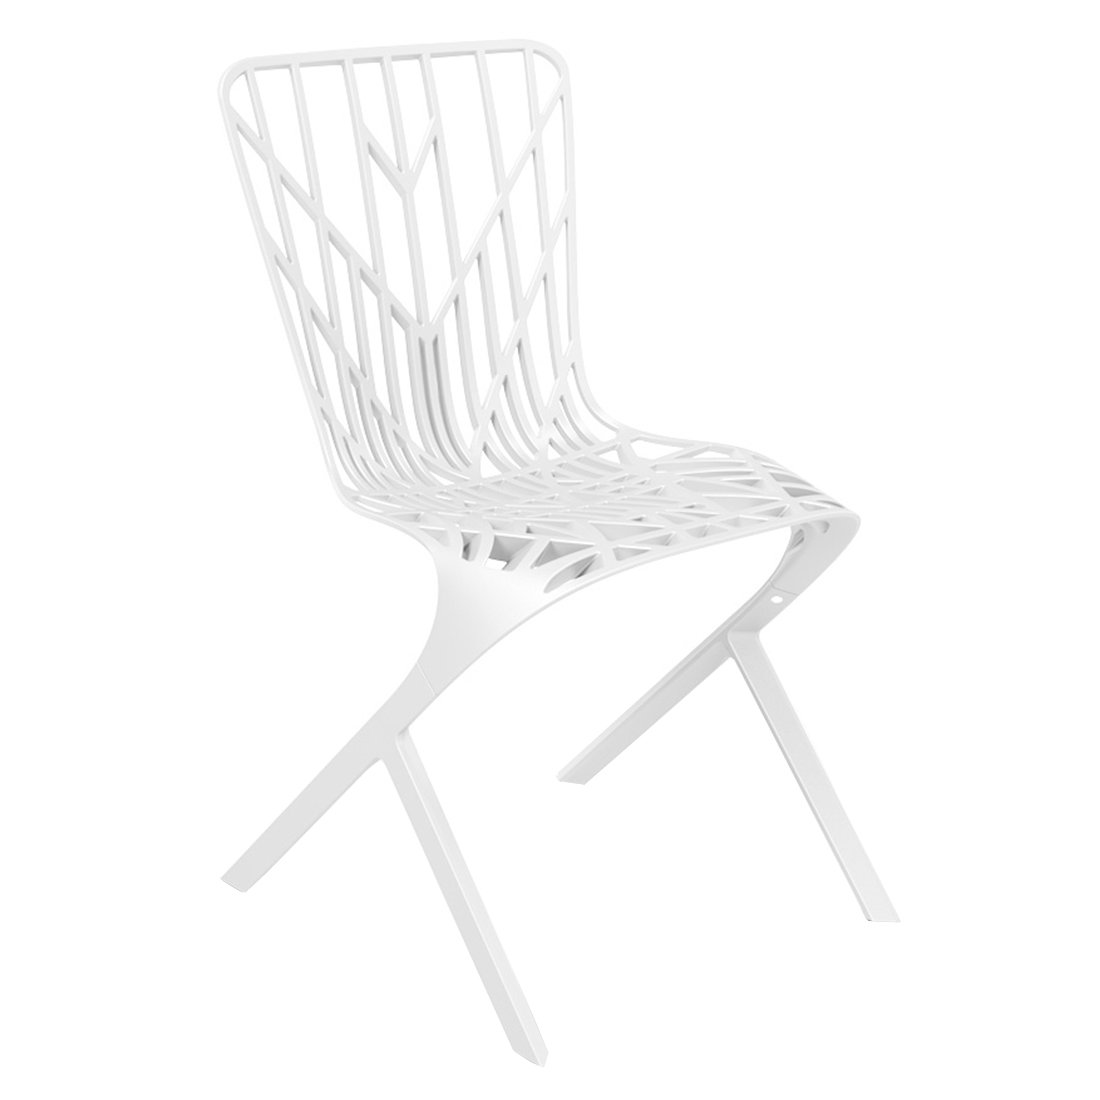 Knoll Washington Skeleton Chair - Wit